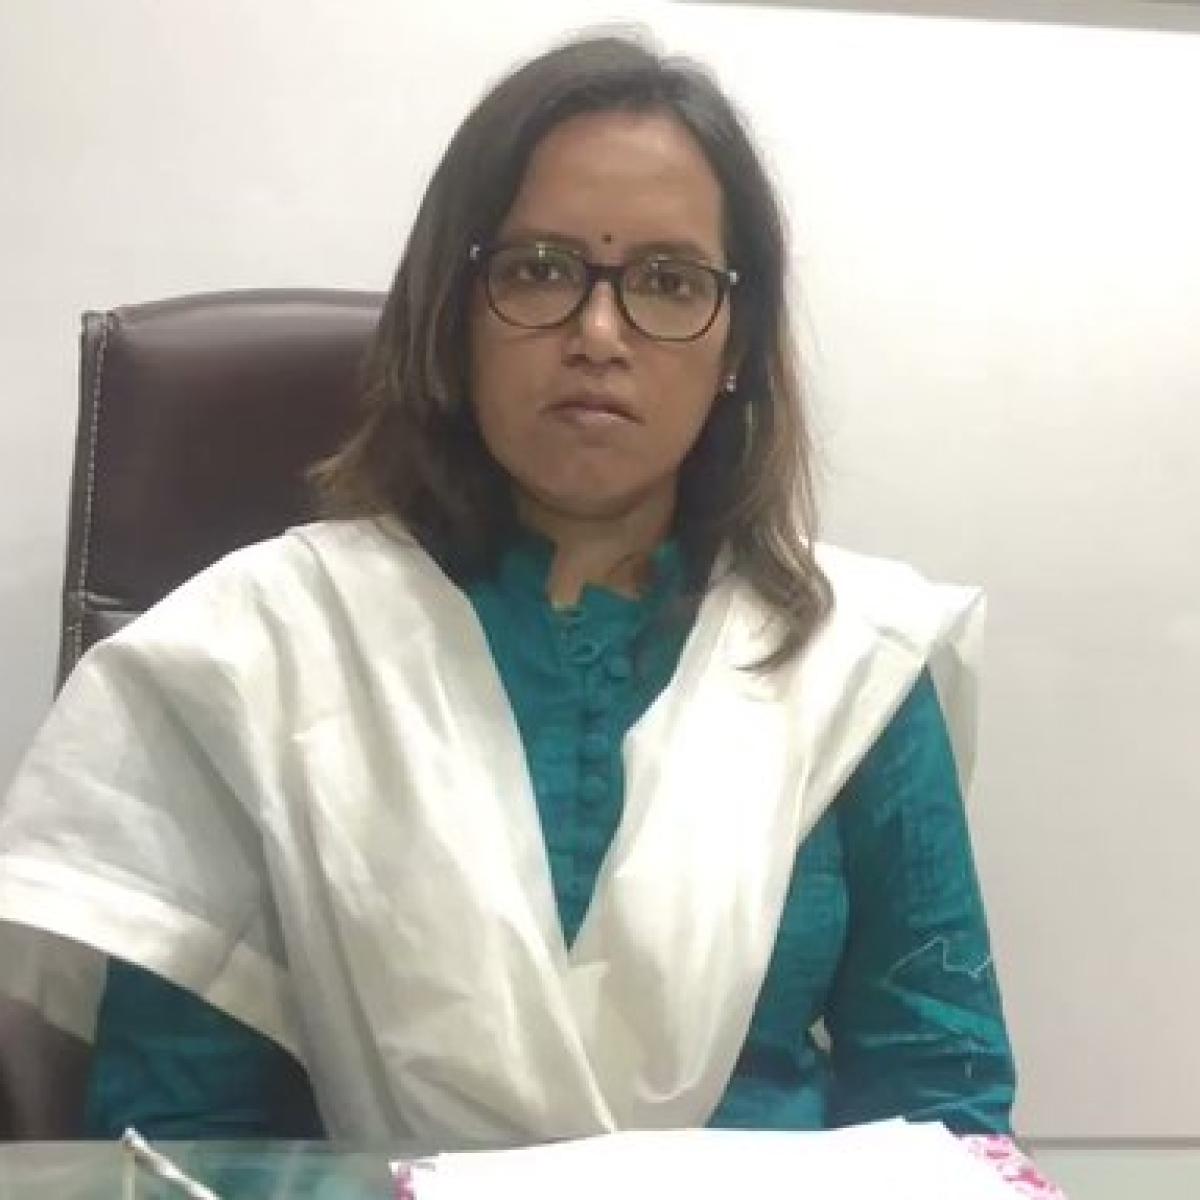 Coronavirus in Mumbai: Maharashtra Minister Varsha Gaikwad says Dharavi needs a special plan to cope with COVID-19 pandemic